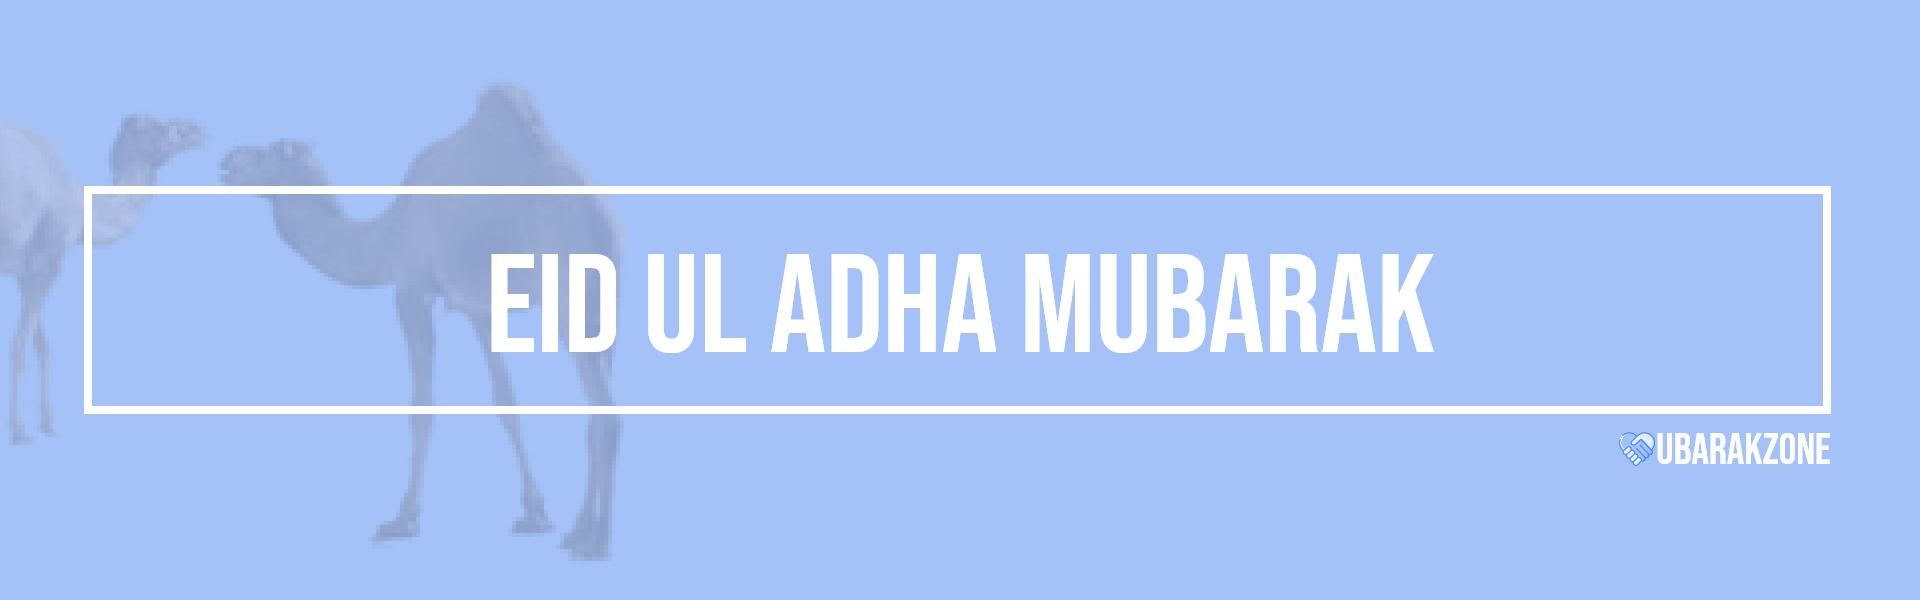 eid ul adha mubarak wishes messages